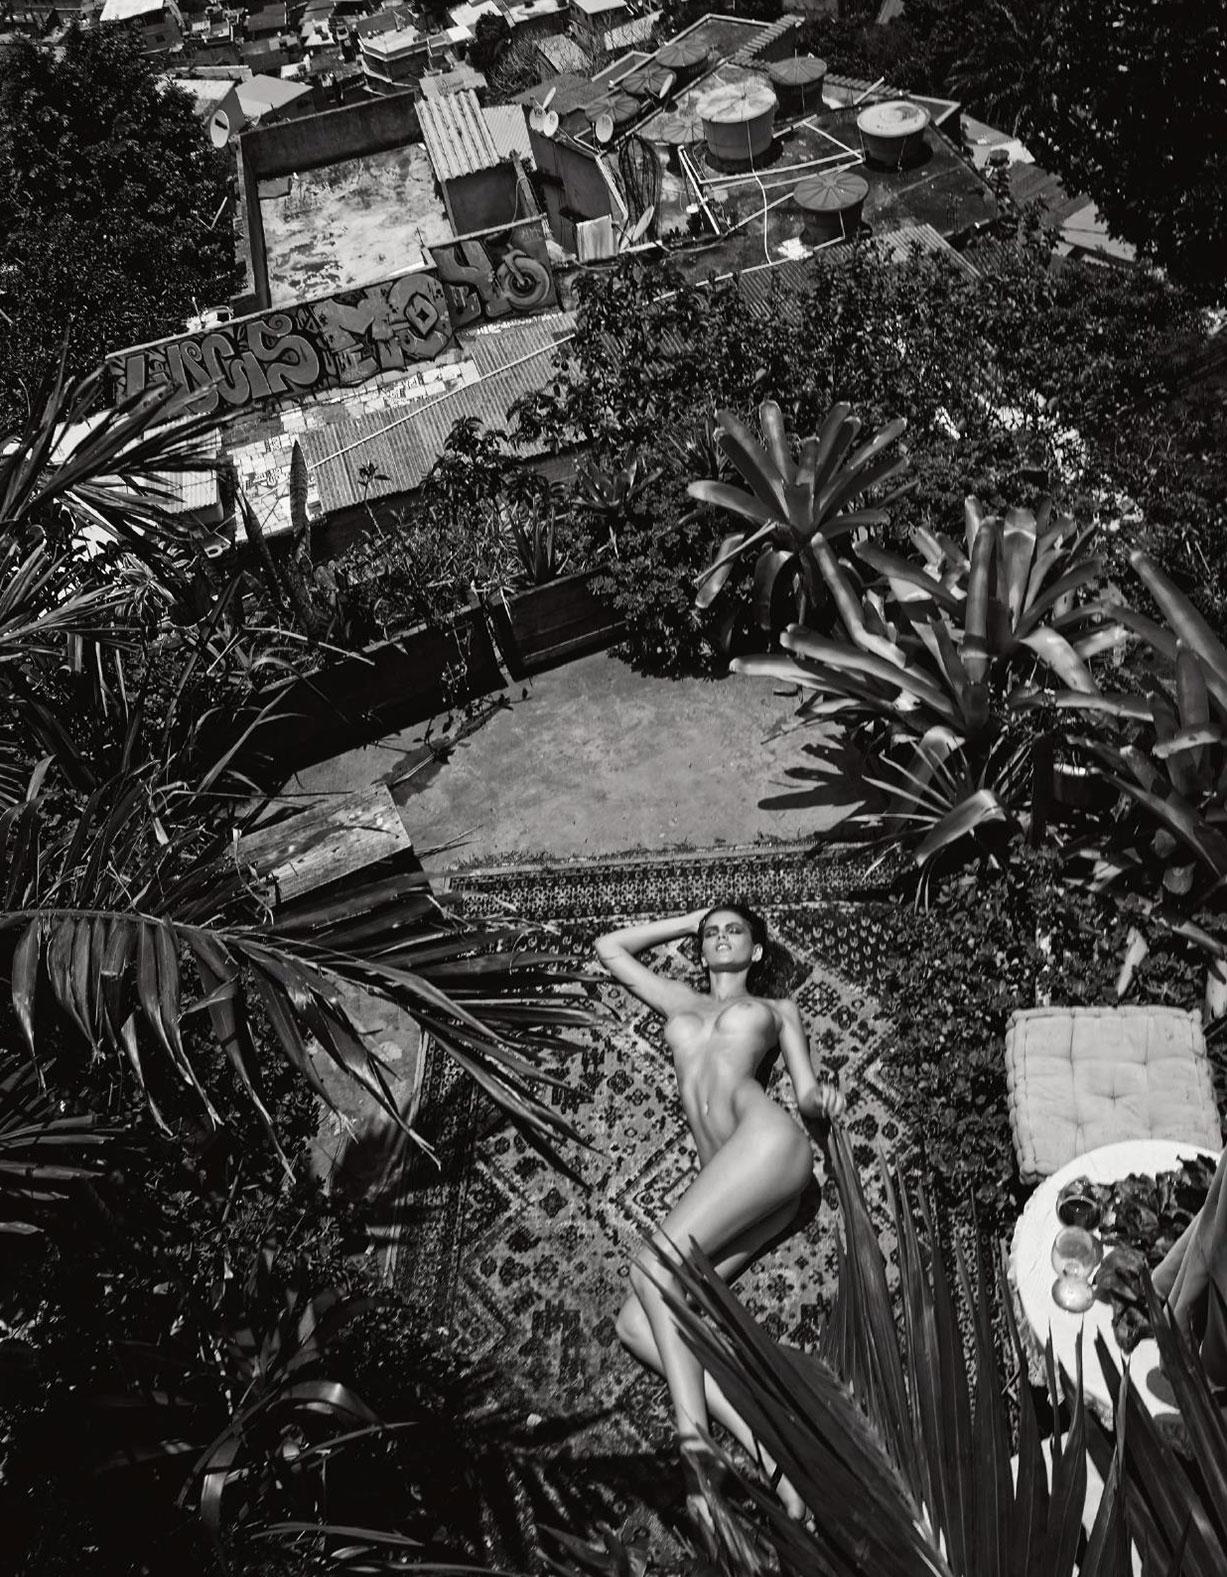 обнаженная Камила Хансен / Kamila Hansen nude by Fe Pinheiro - Lui Magazine february 2017